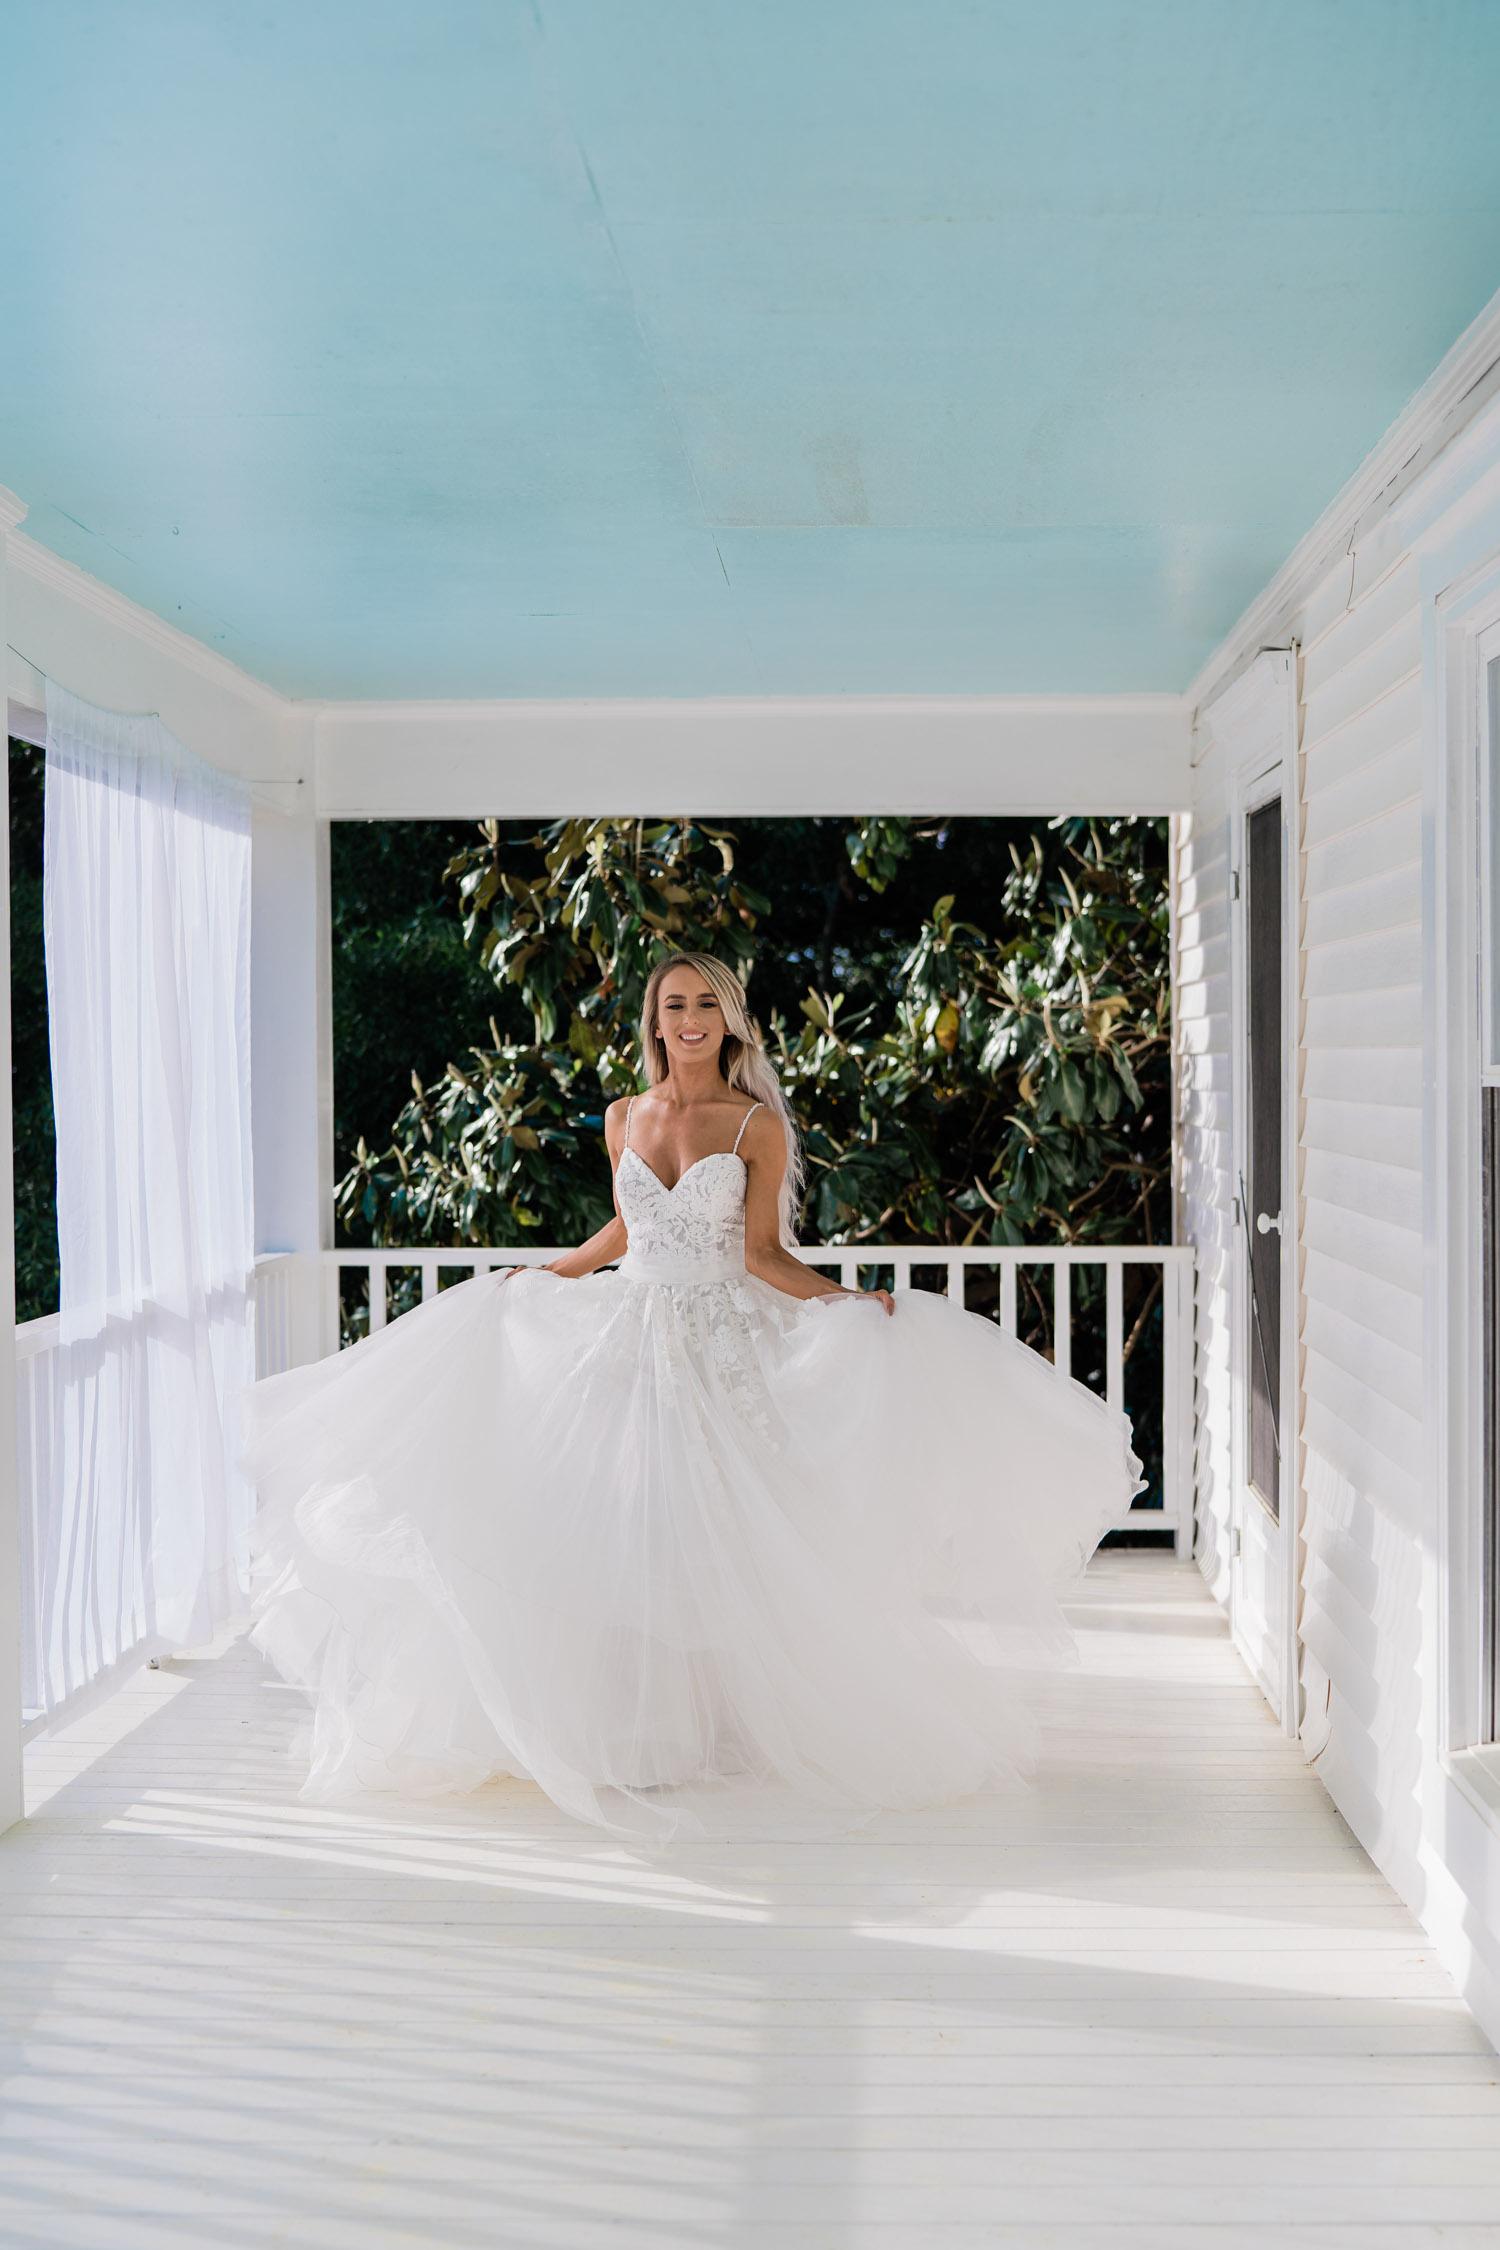 Styled Wedding & Engagement Shoot06758.jpg